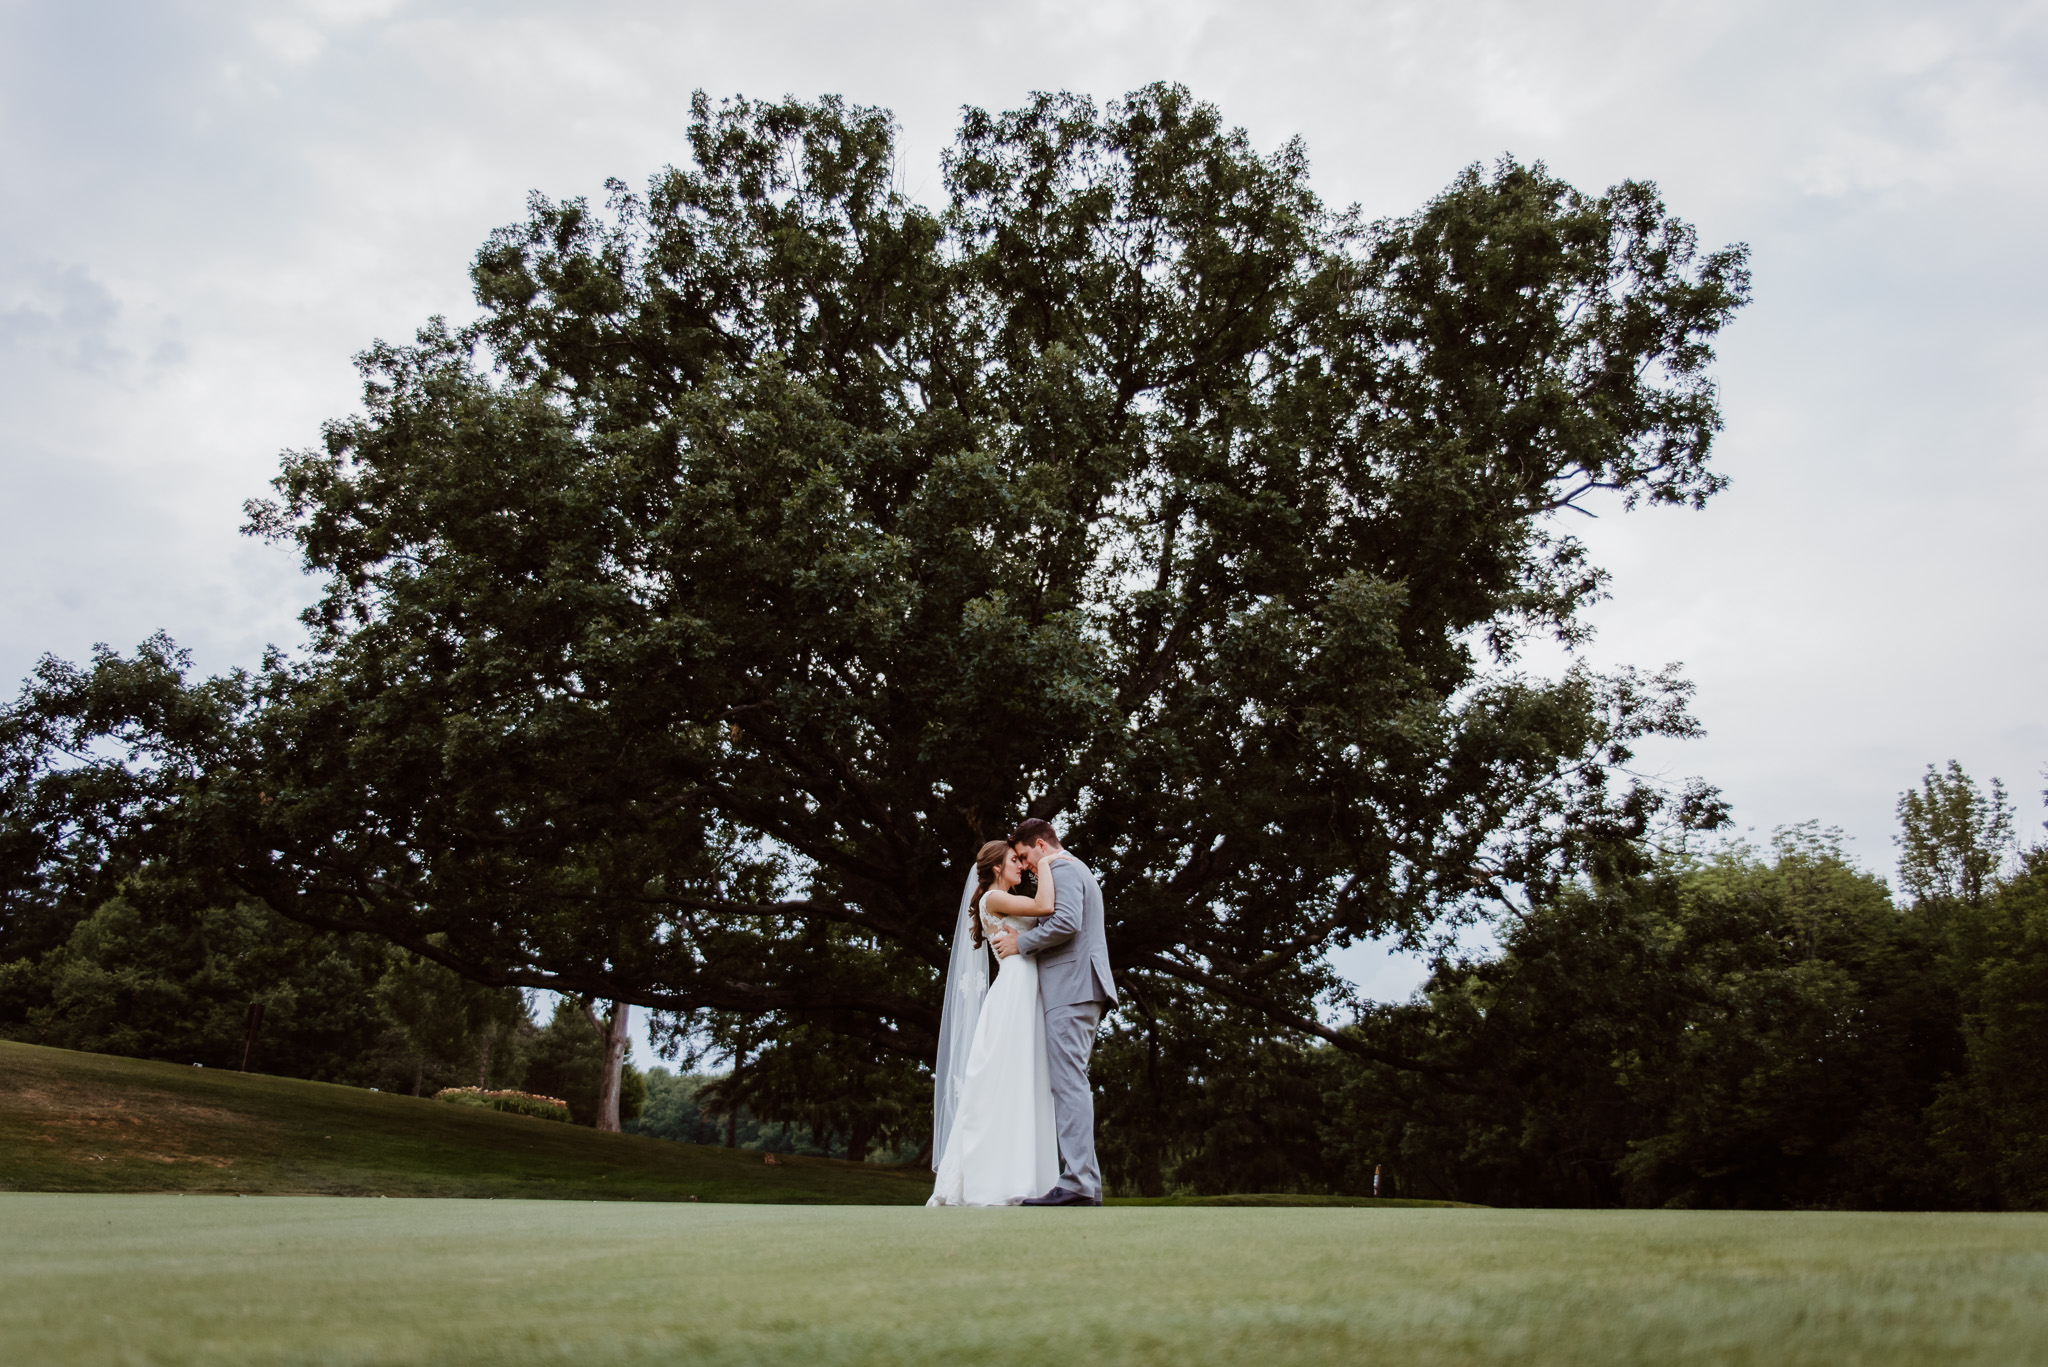 Buffalo-NY-Wedding-Photographer-Photography-Portraits